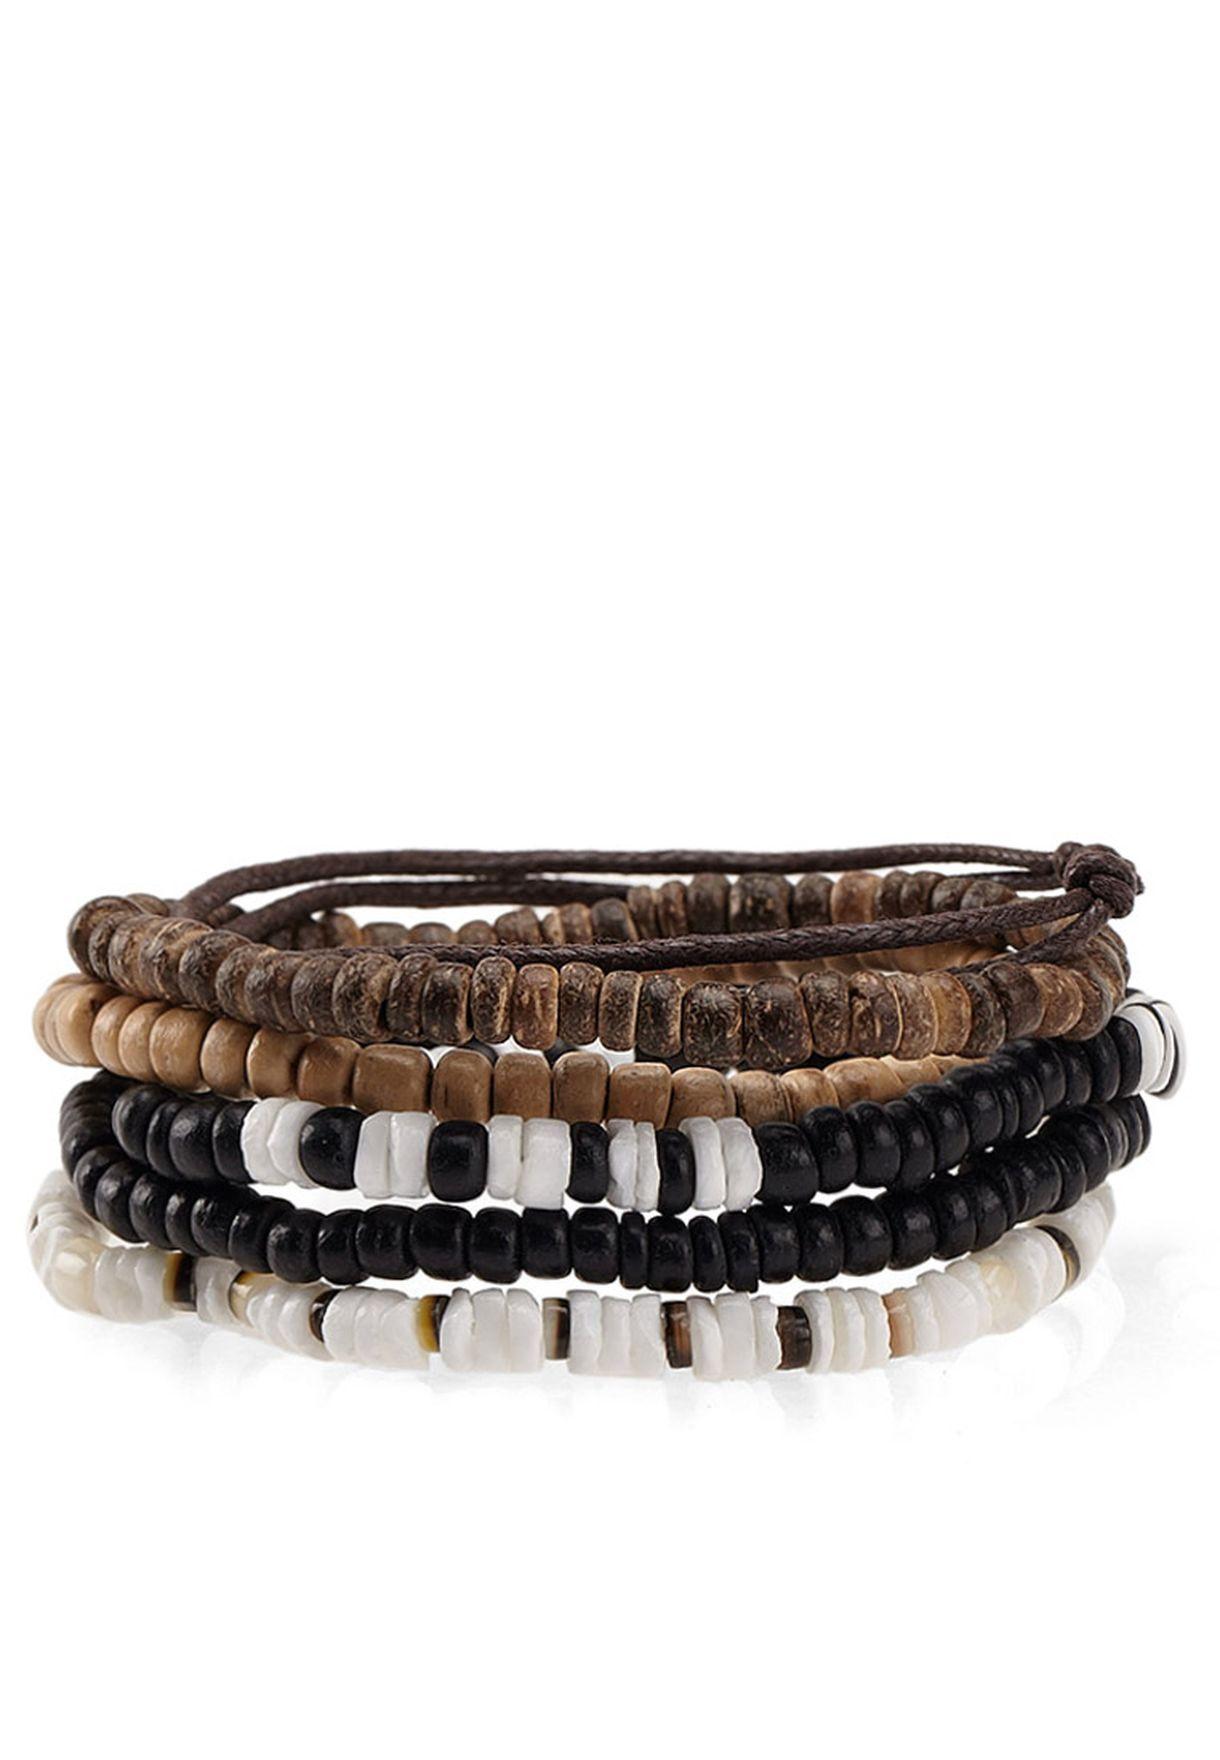 6 Pack Woodstock Bracelets